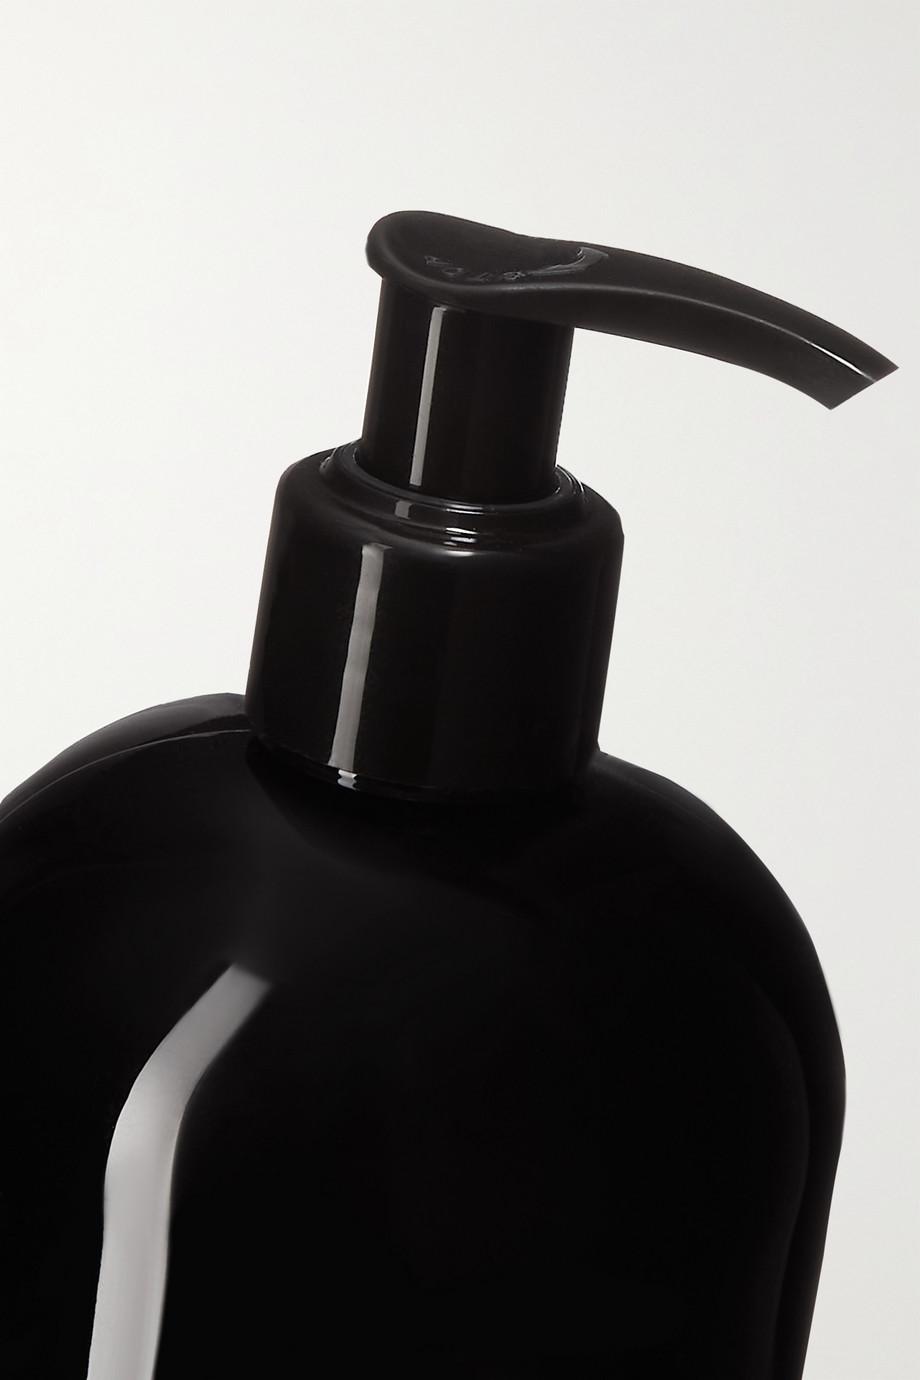 L'Objet Hand + Body Soap - Bois Sauvage, 500ml